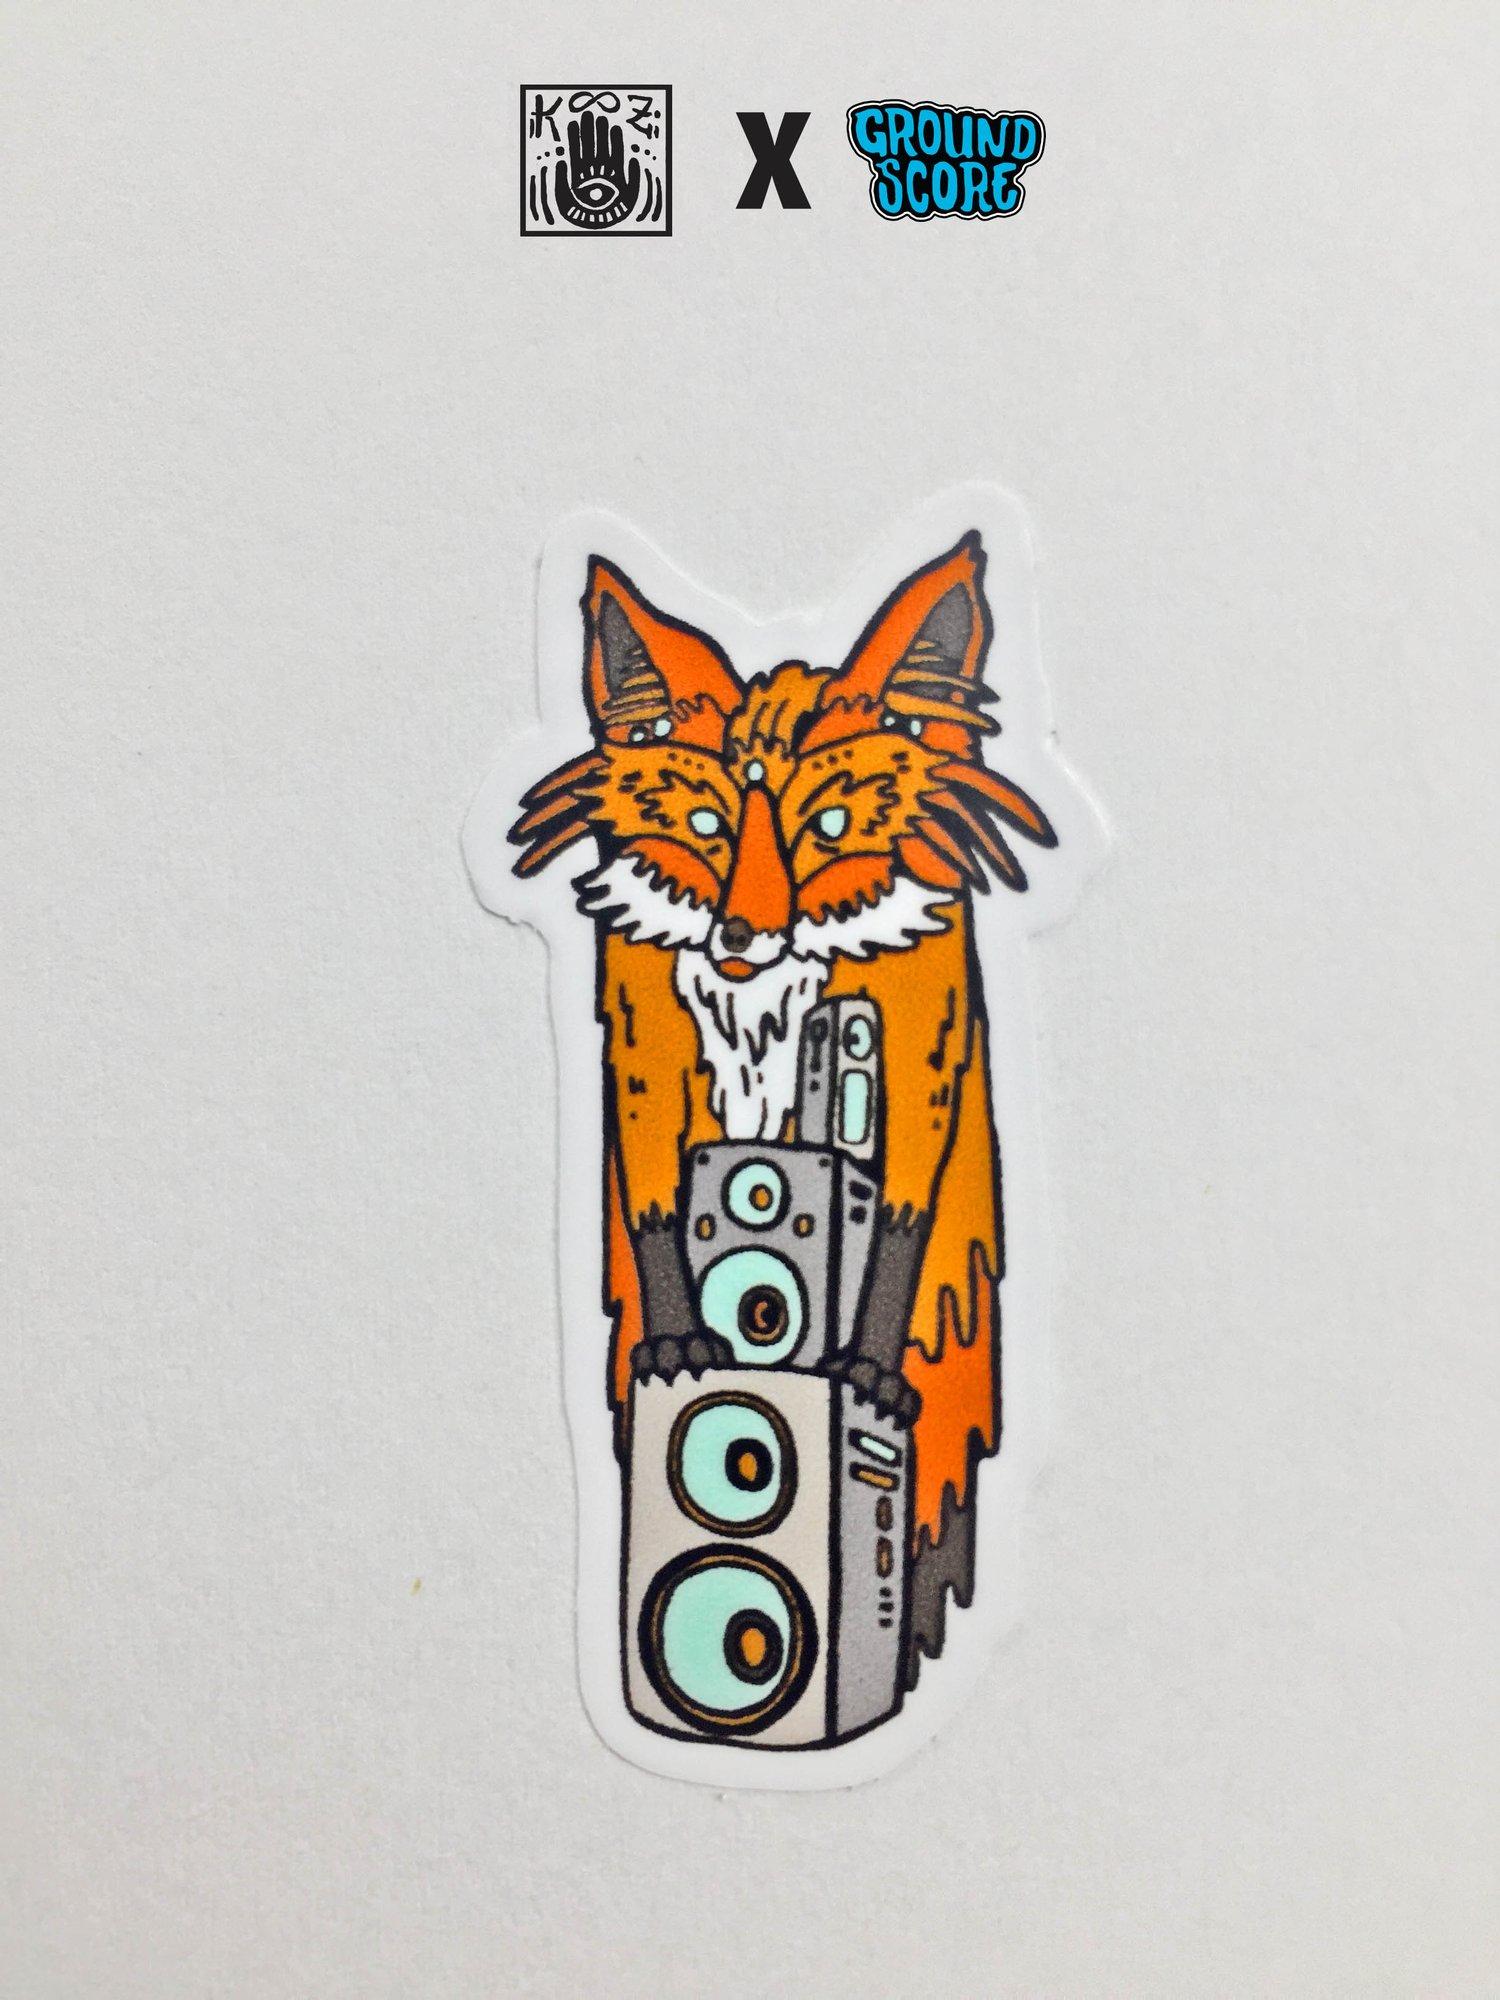 KOOZ - Speakerfox Sticker (5 Pack Combo)